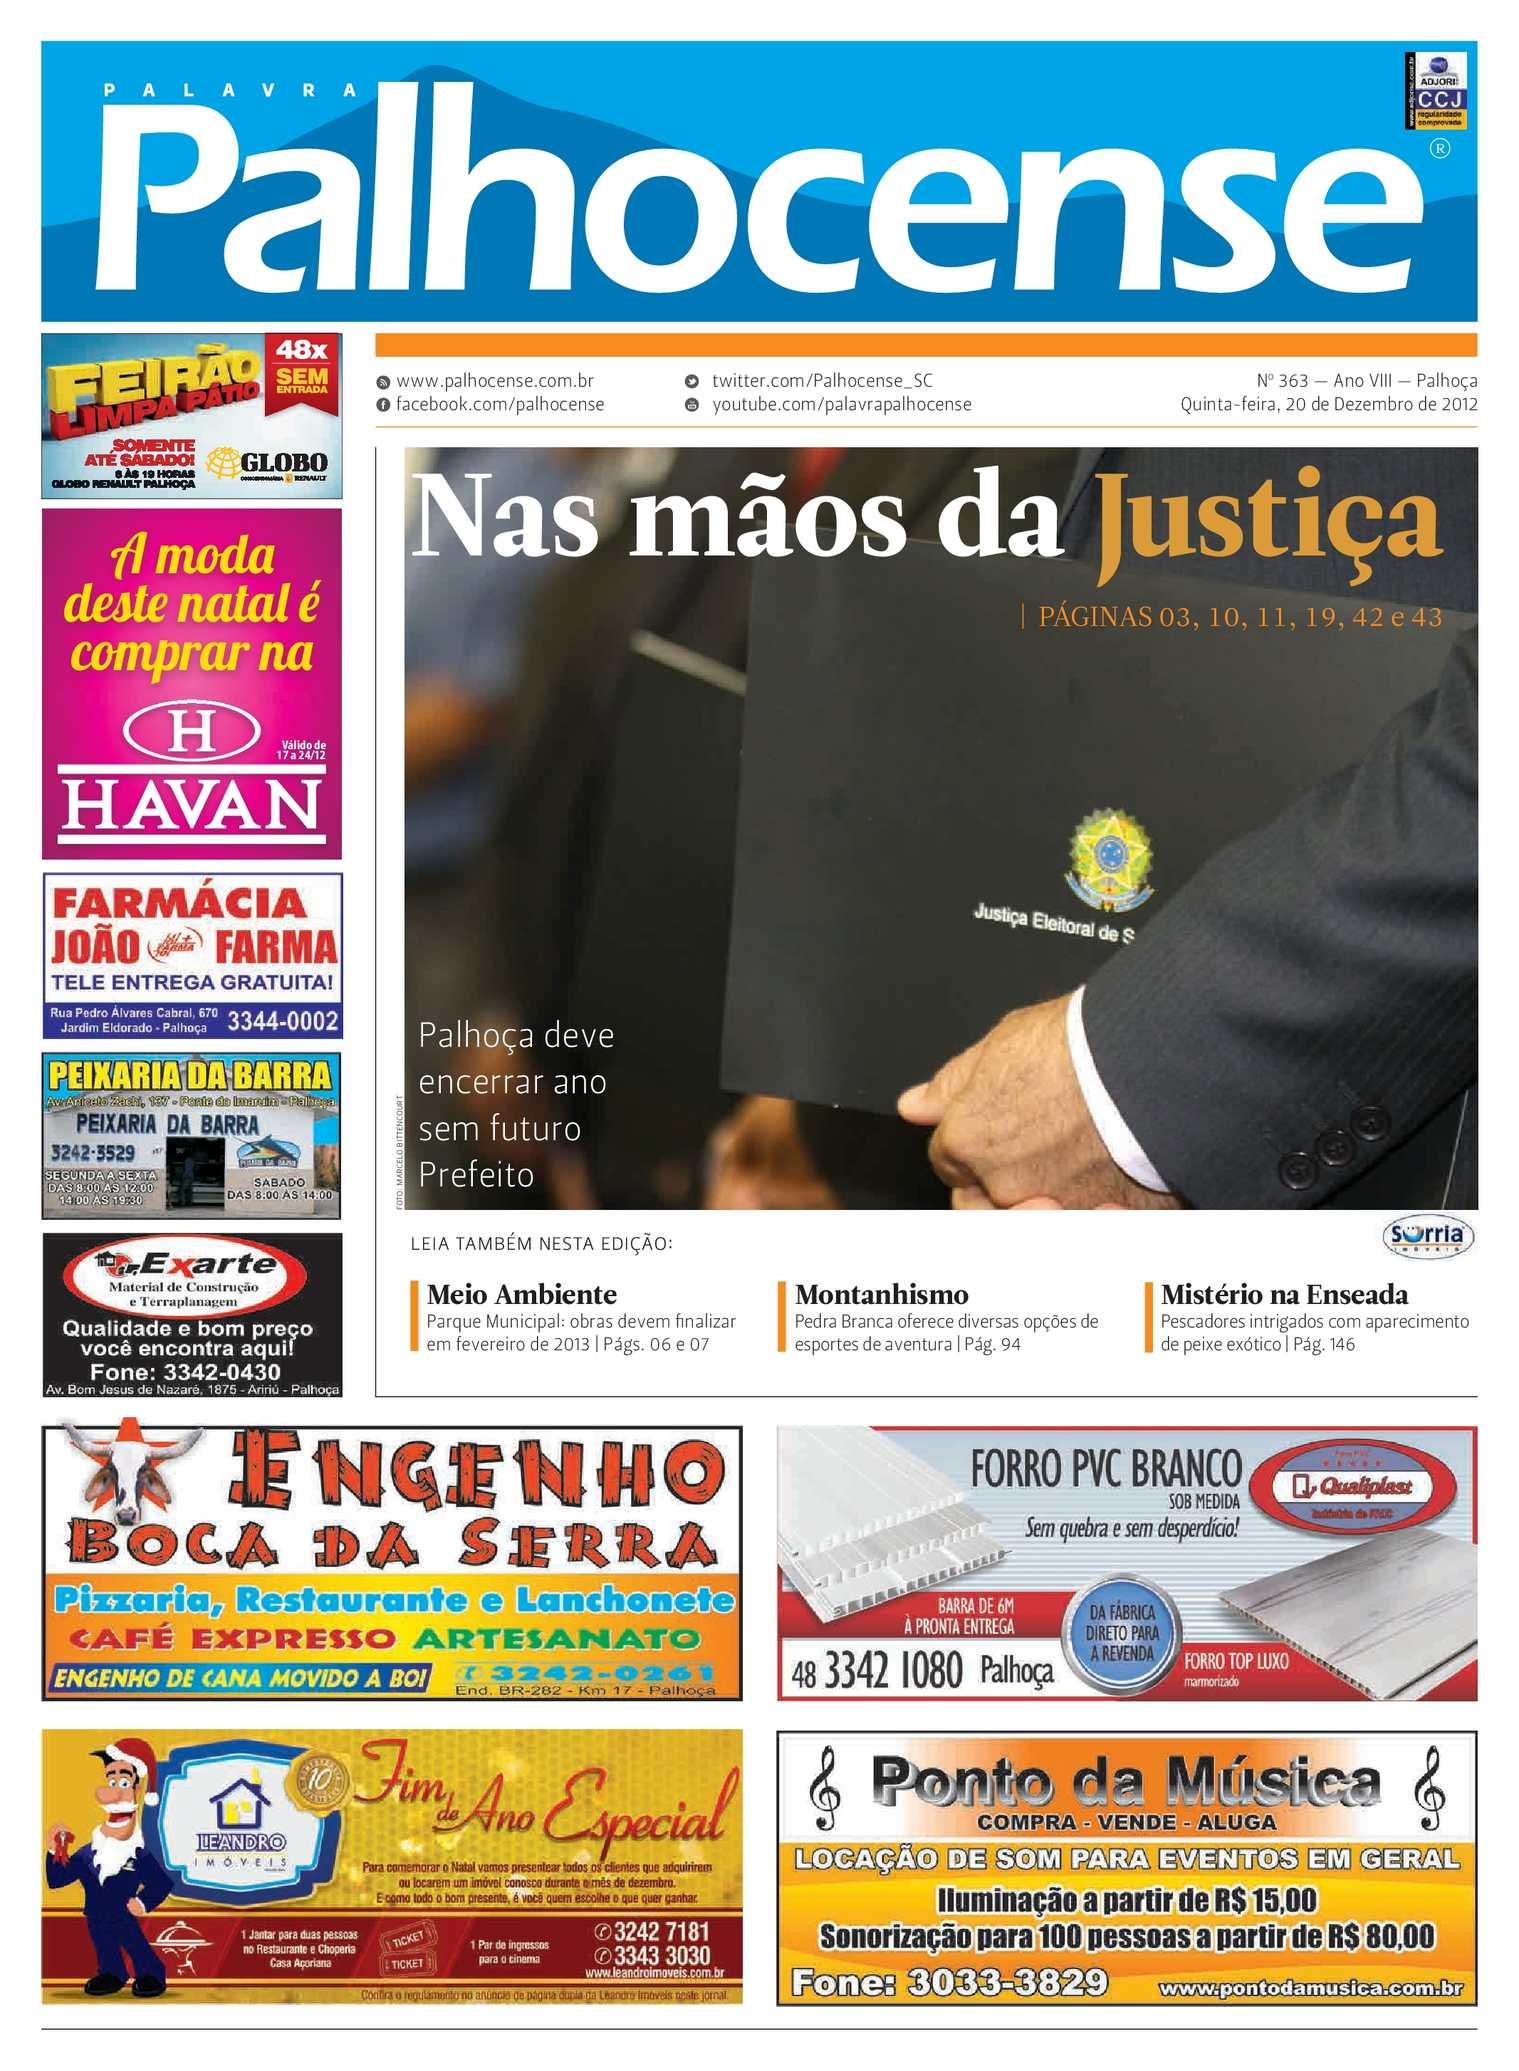 Calaméo - Jornal Palavra Palhocense - Edição 363 146cbd32ce